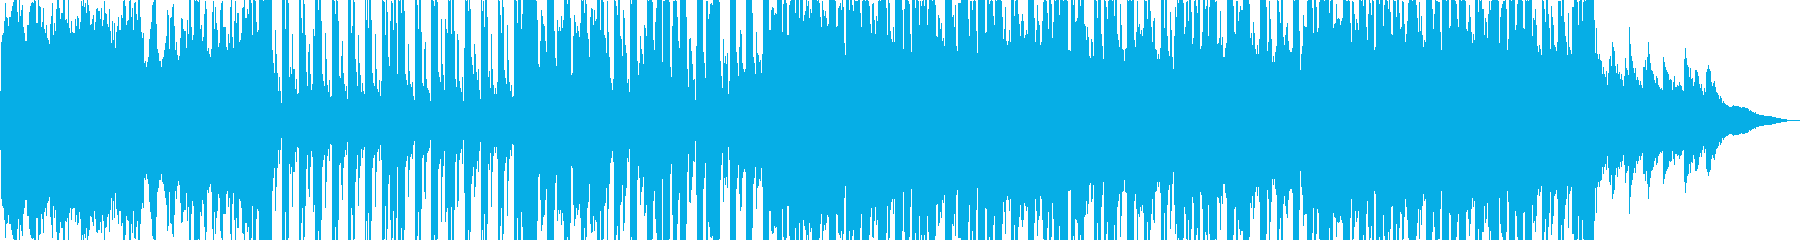 JAZZ FUNK メロディなしの再生済みの波形